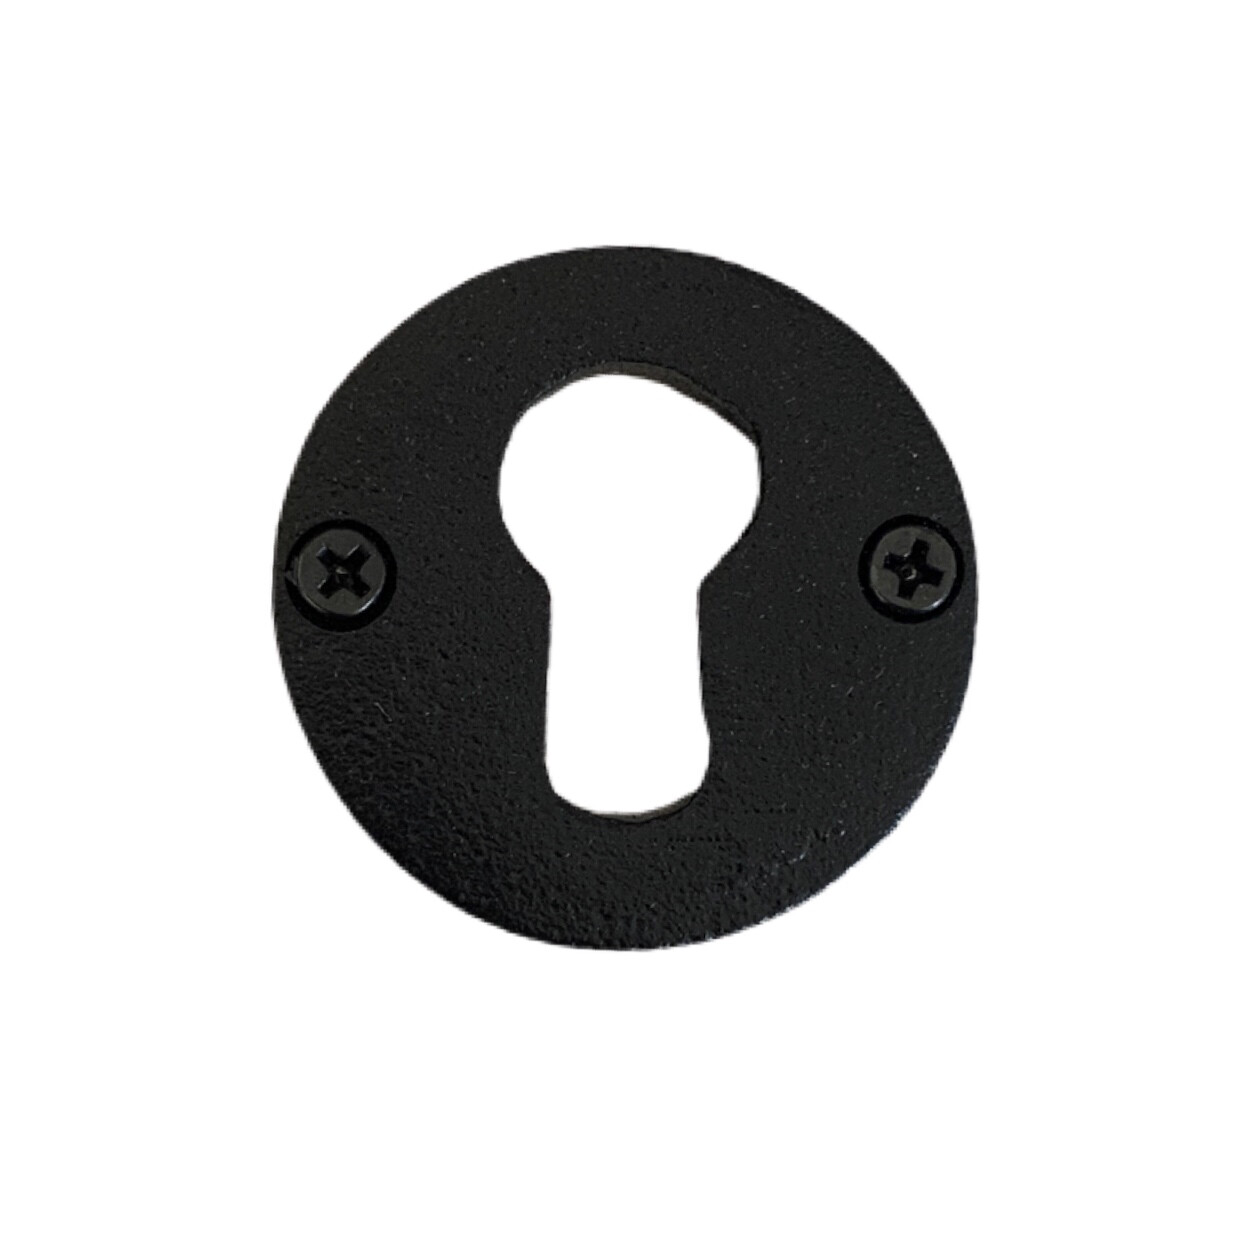 Black Escutcheon Knobs